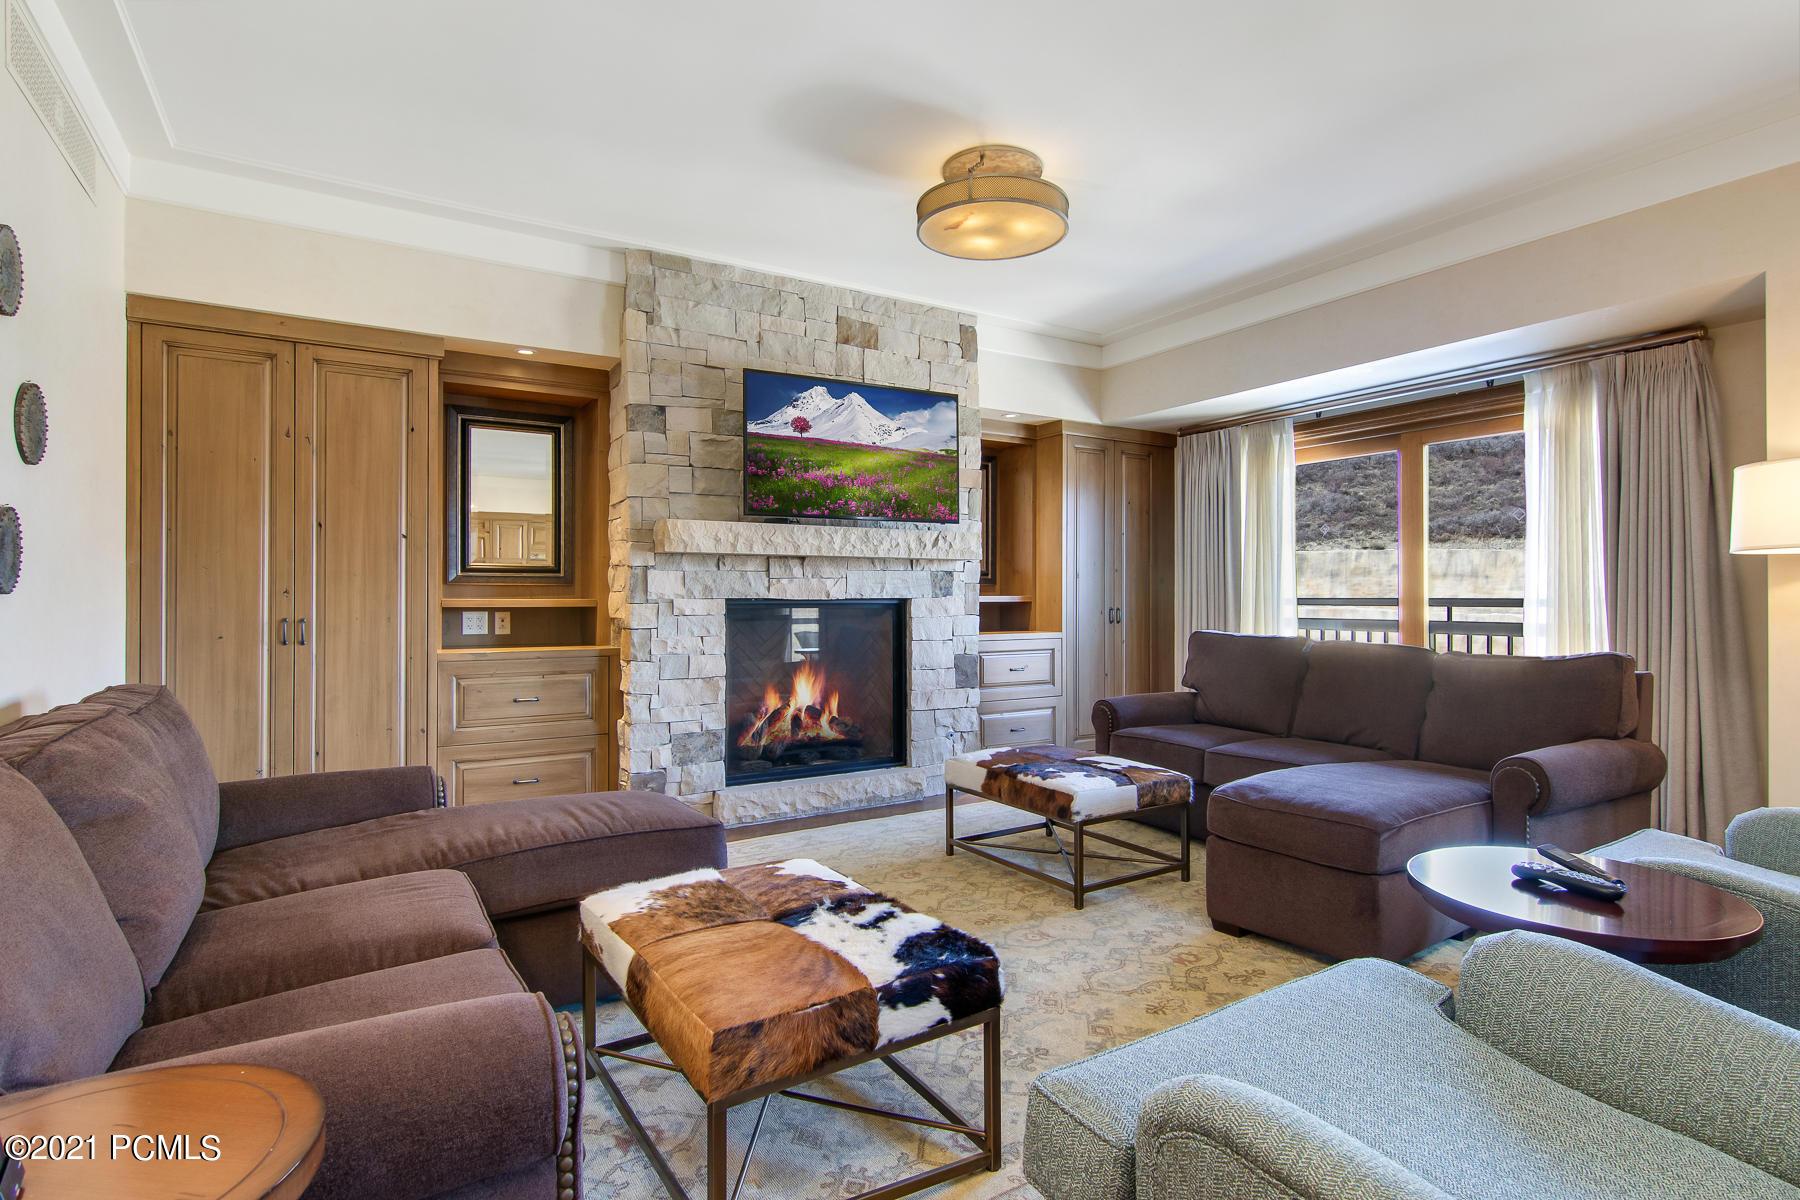 2300 Deer Valley Drive, Park City, Utah 84060, 2 Bedrooms Bedrooms, ,4 BathroomsBathrooms,Condominium,For Sale,Deer Valley,12101422